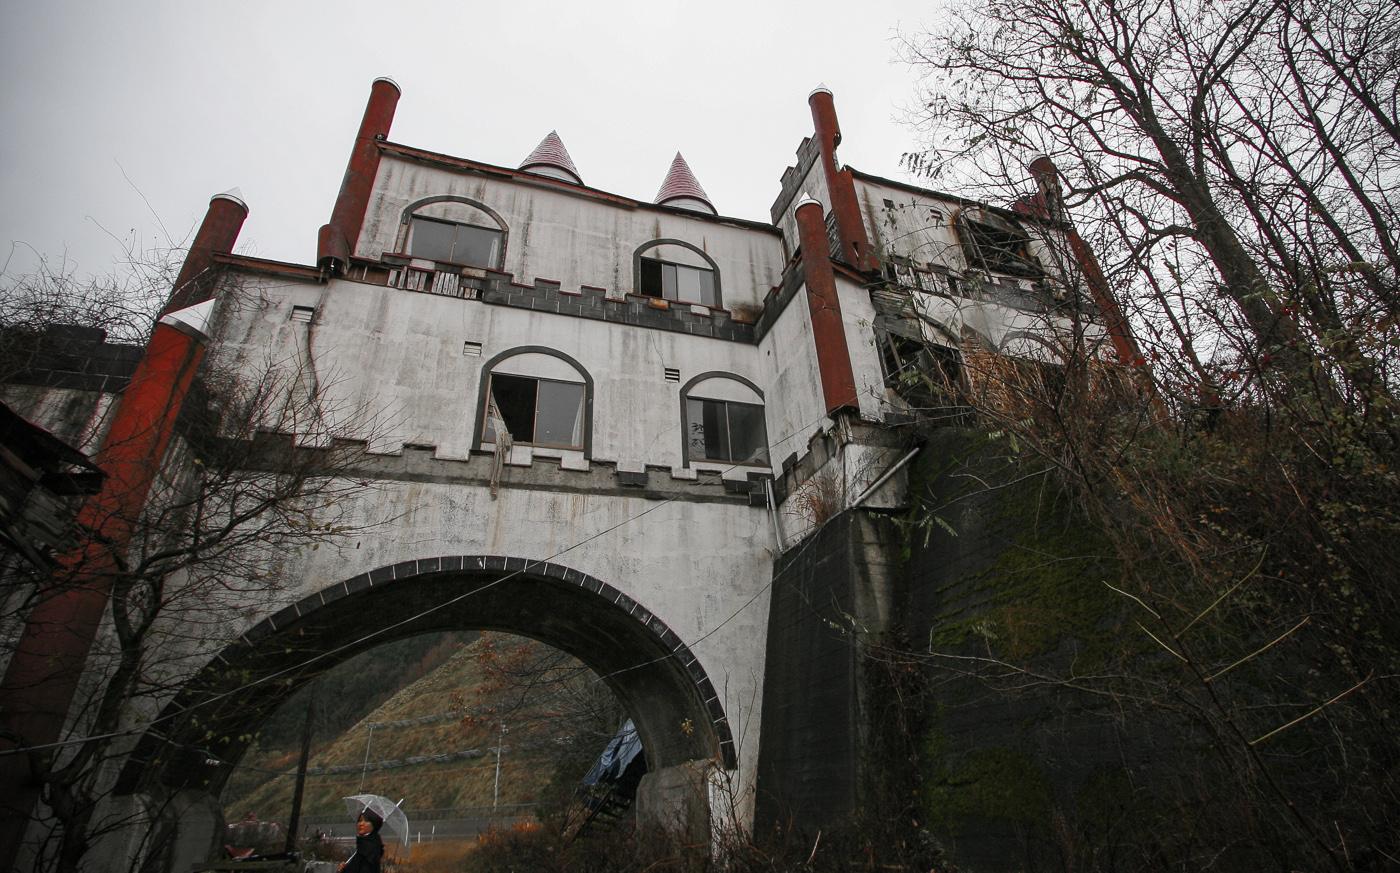 Abandoned Service Area 湯の沢温泉ドライブイン